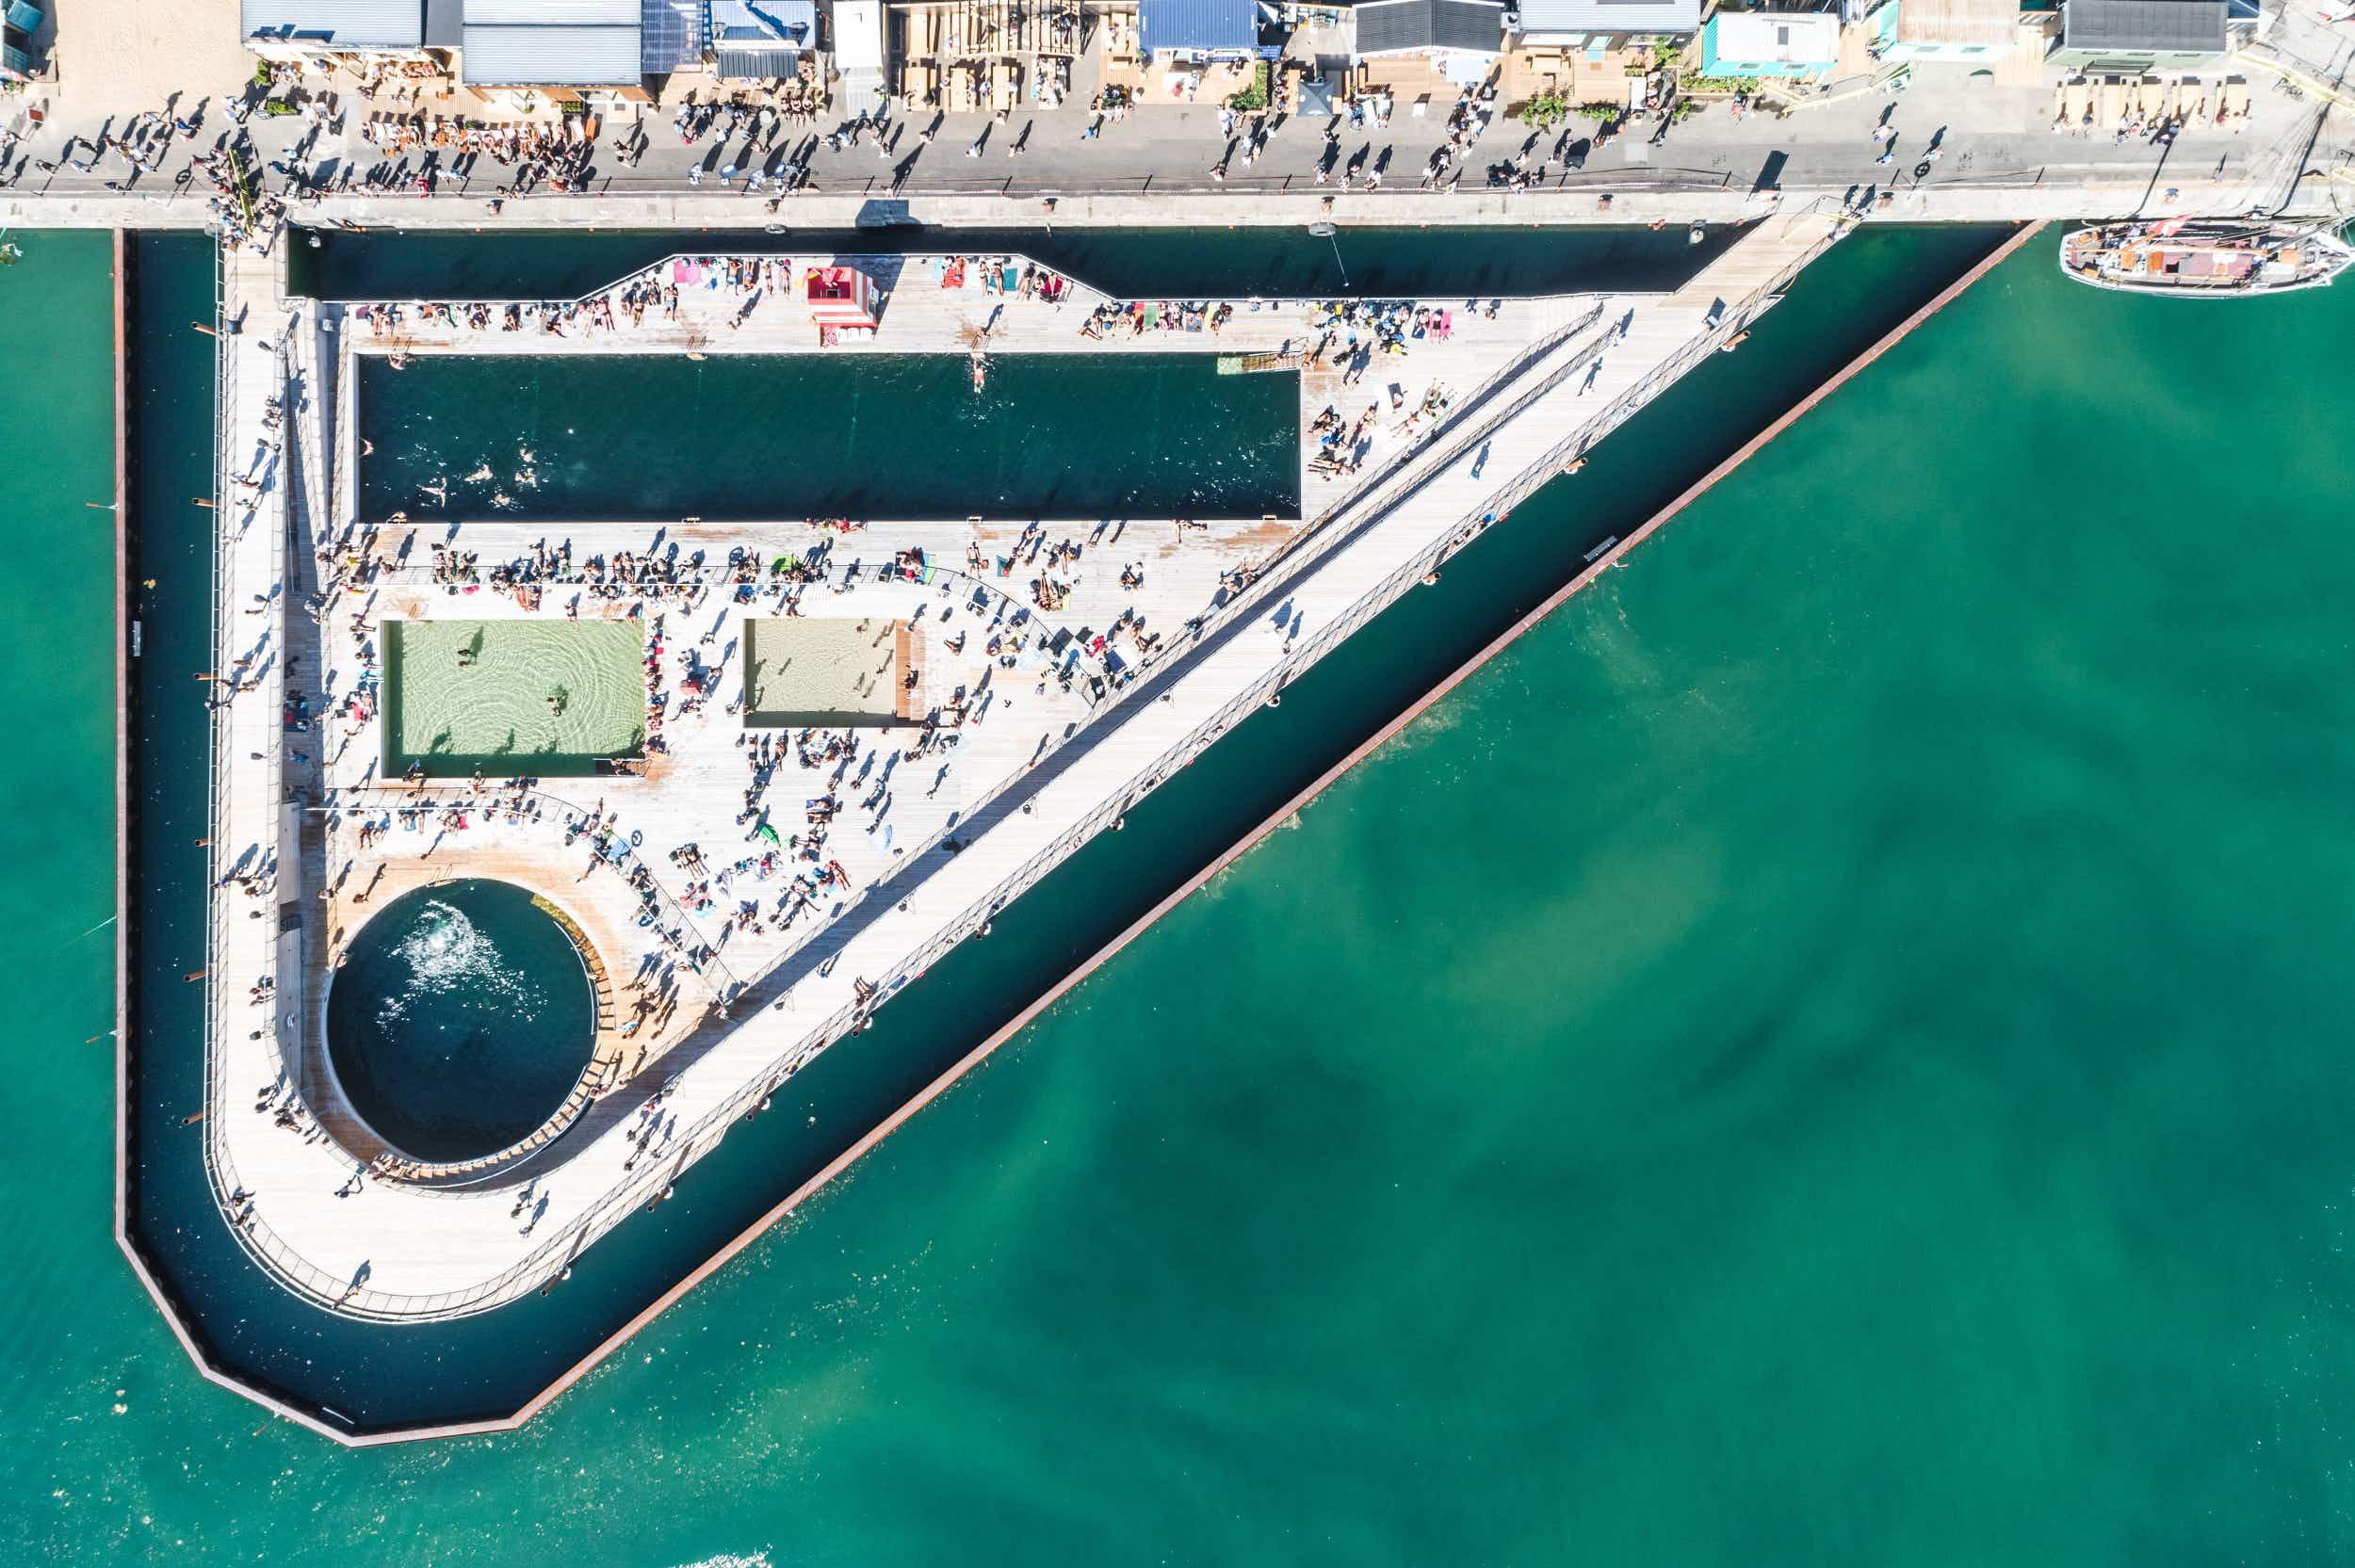 Swim in the world's largest seawater baths in Denmark